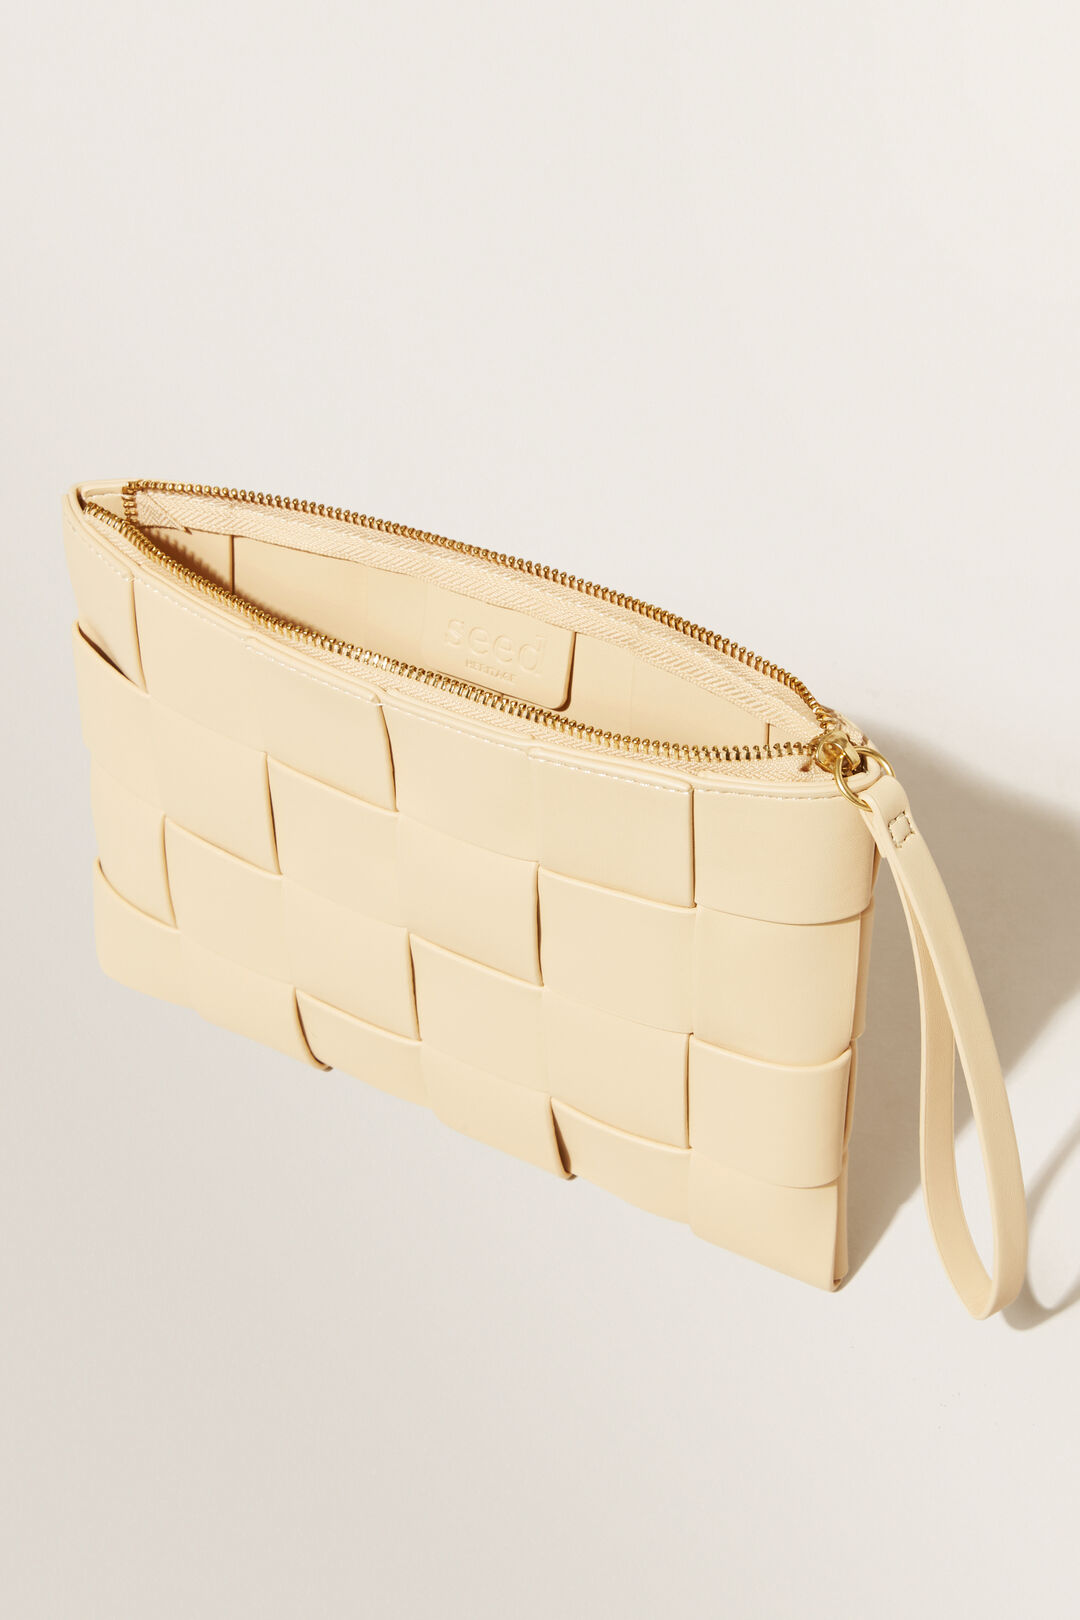 Weave Detail Clutch  BUTTER  hi-res